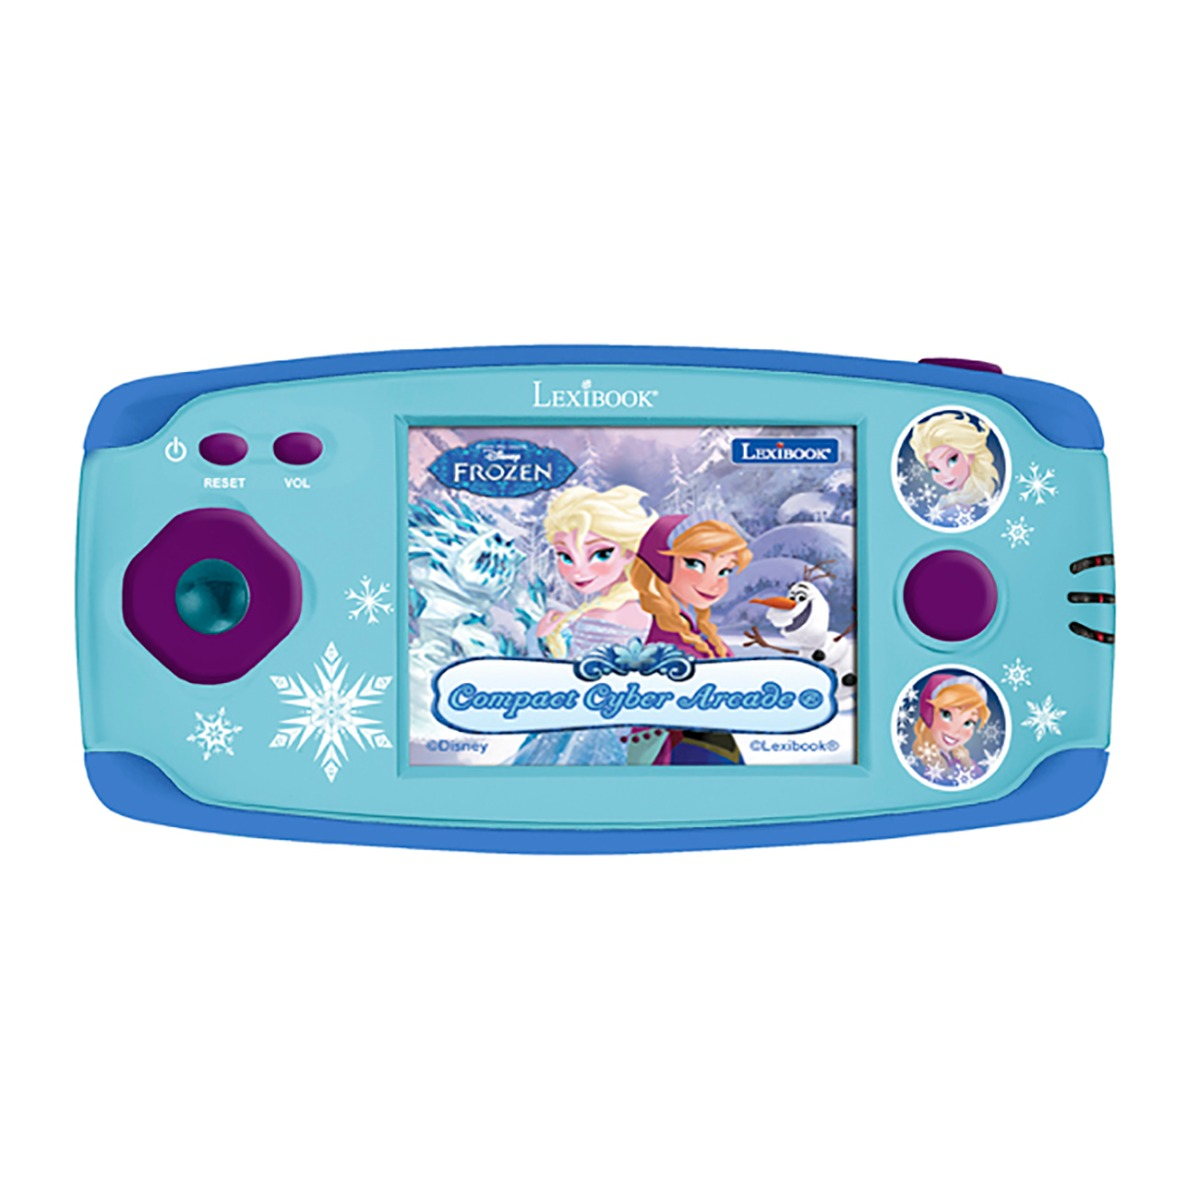 Consola portabila Cyber Arcade Disney Frozen, 150 jocuri